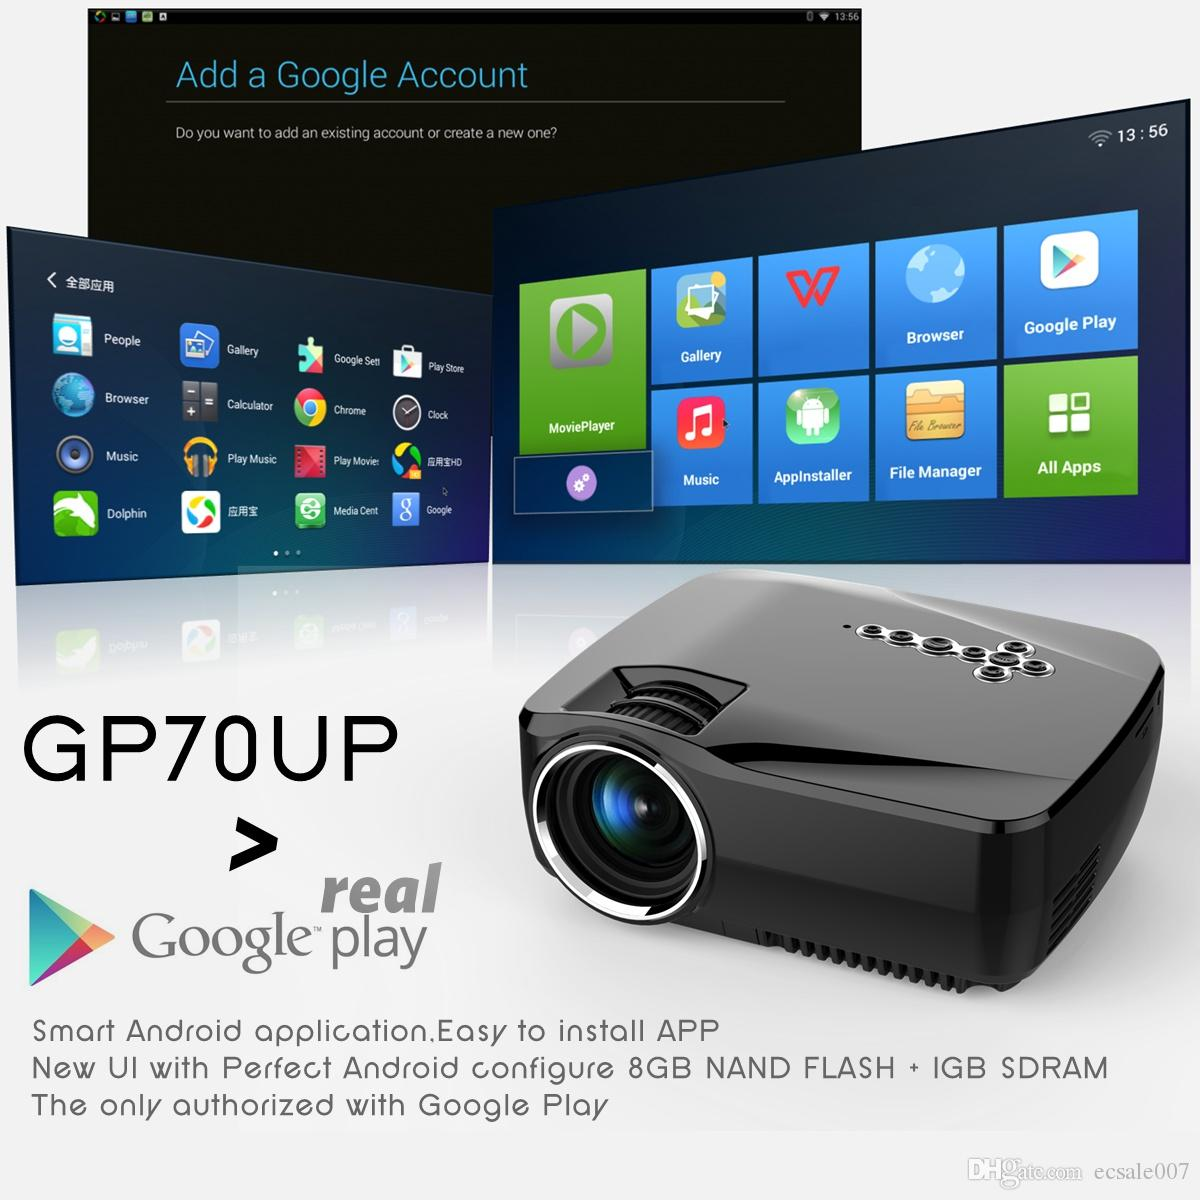 GP70UP مايكرو اللاسلكية العارض 1200 شمعة مع نظام التشغيل أندرويد 6.0 ، واي فاي العارض سعر الجملة